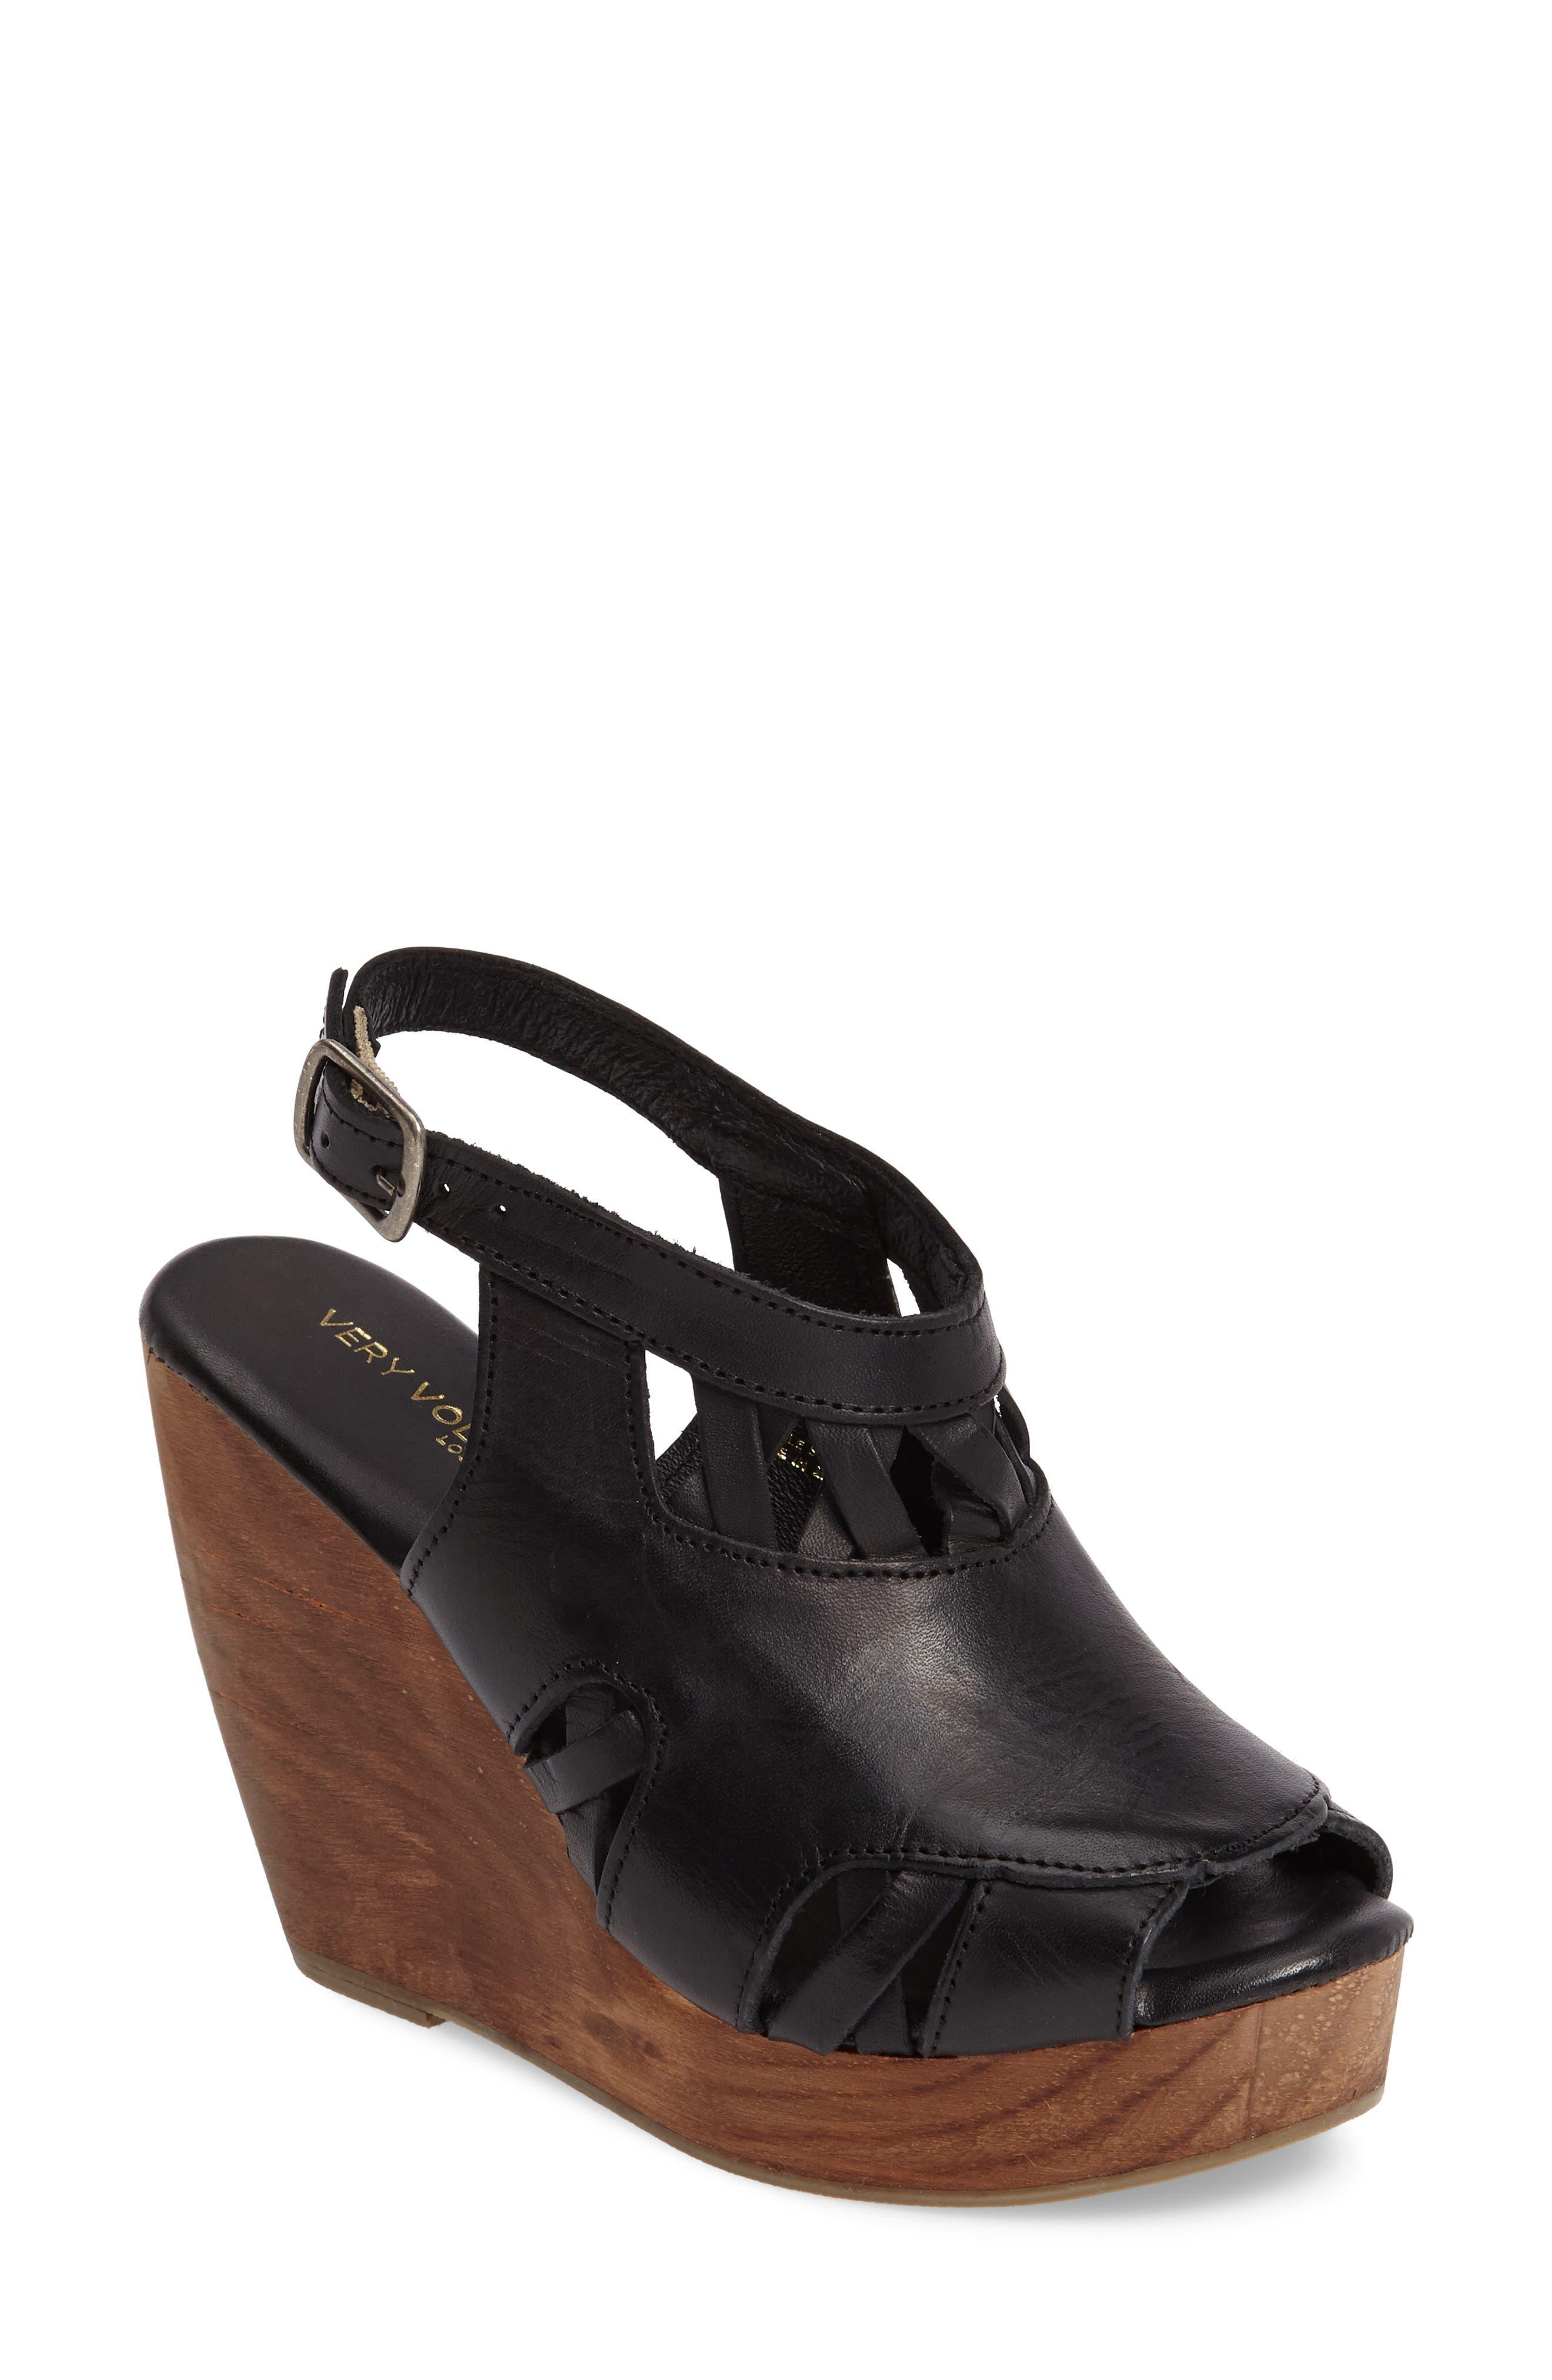 Main Image - Very Volatile Sloane Platform Wedge Sandal (Women)